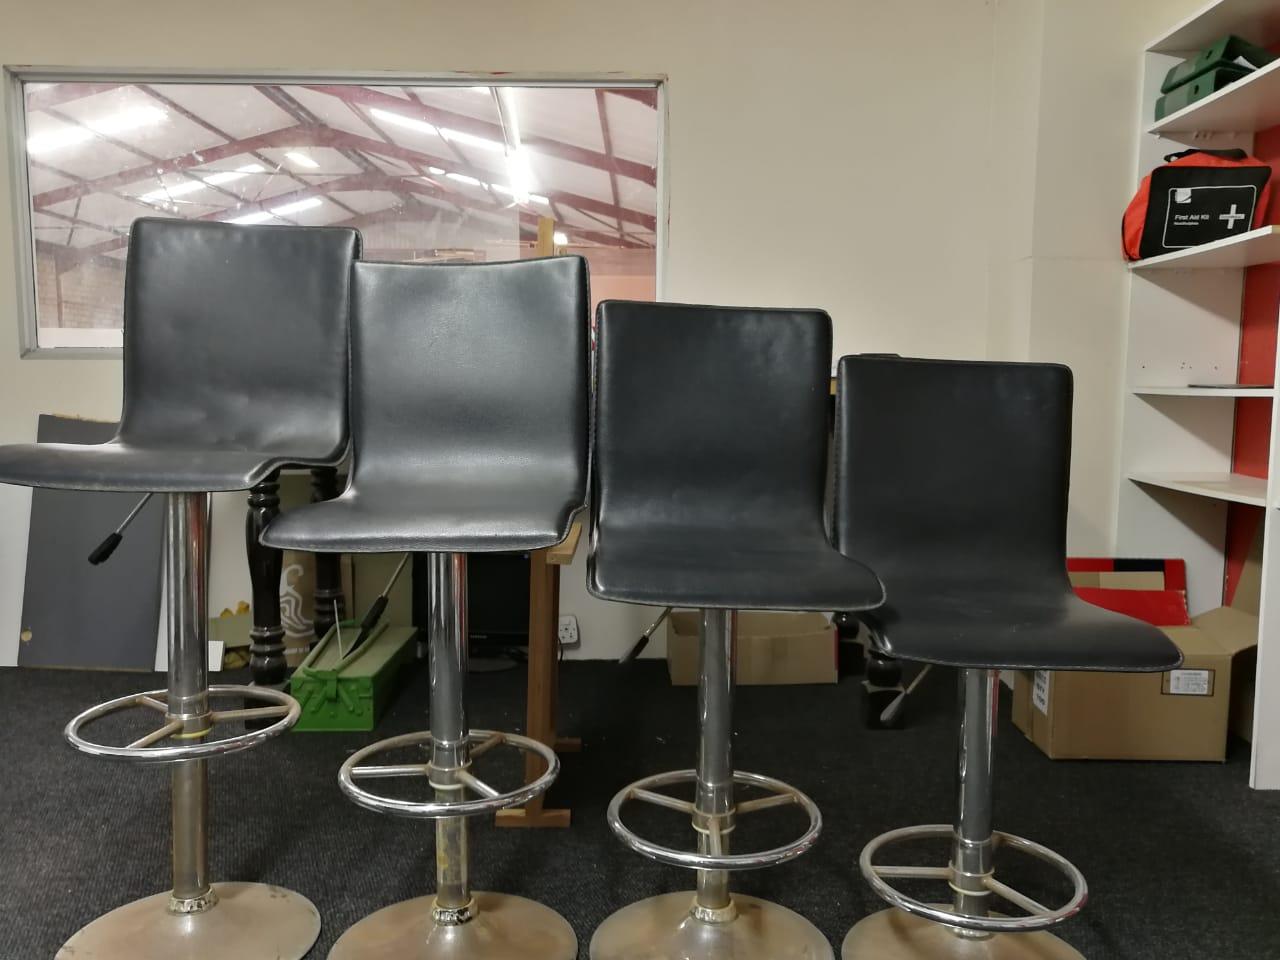 4 rotating adjustable bar stools